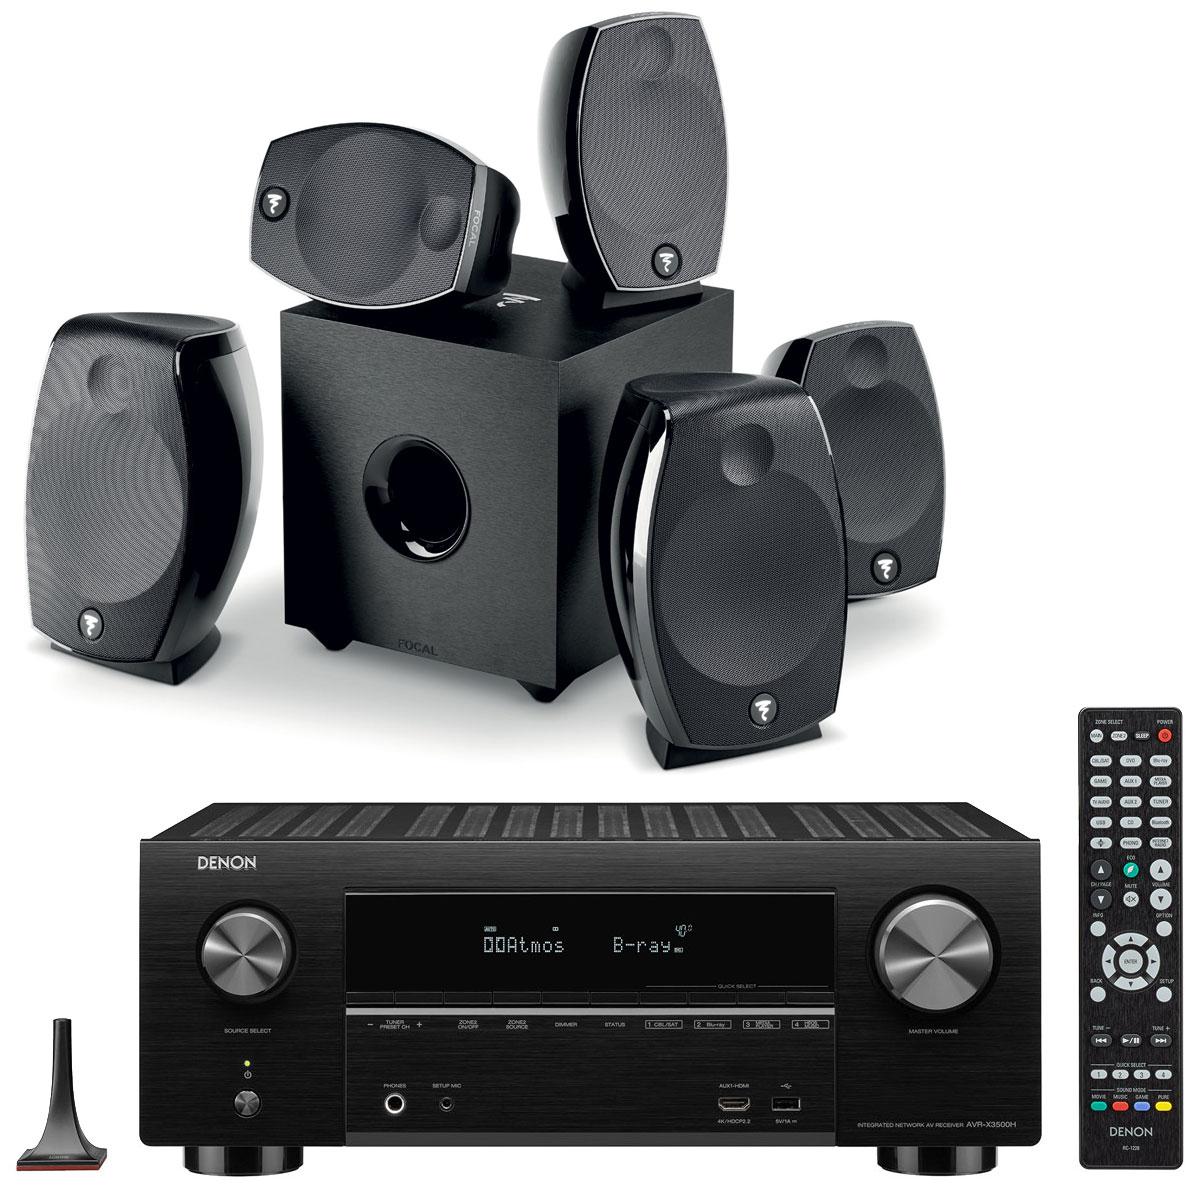 Ampli-tuner Home Cinema 7.2 Denon AVR-X3500H Noir + Pack d'enceintes 5.1.2 Focal Sib Evo